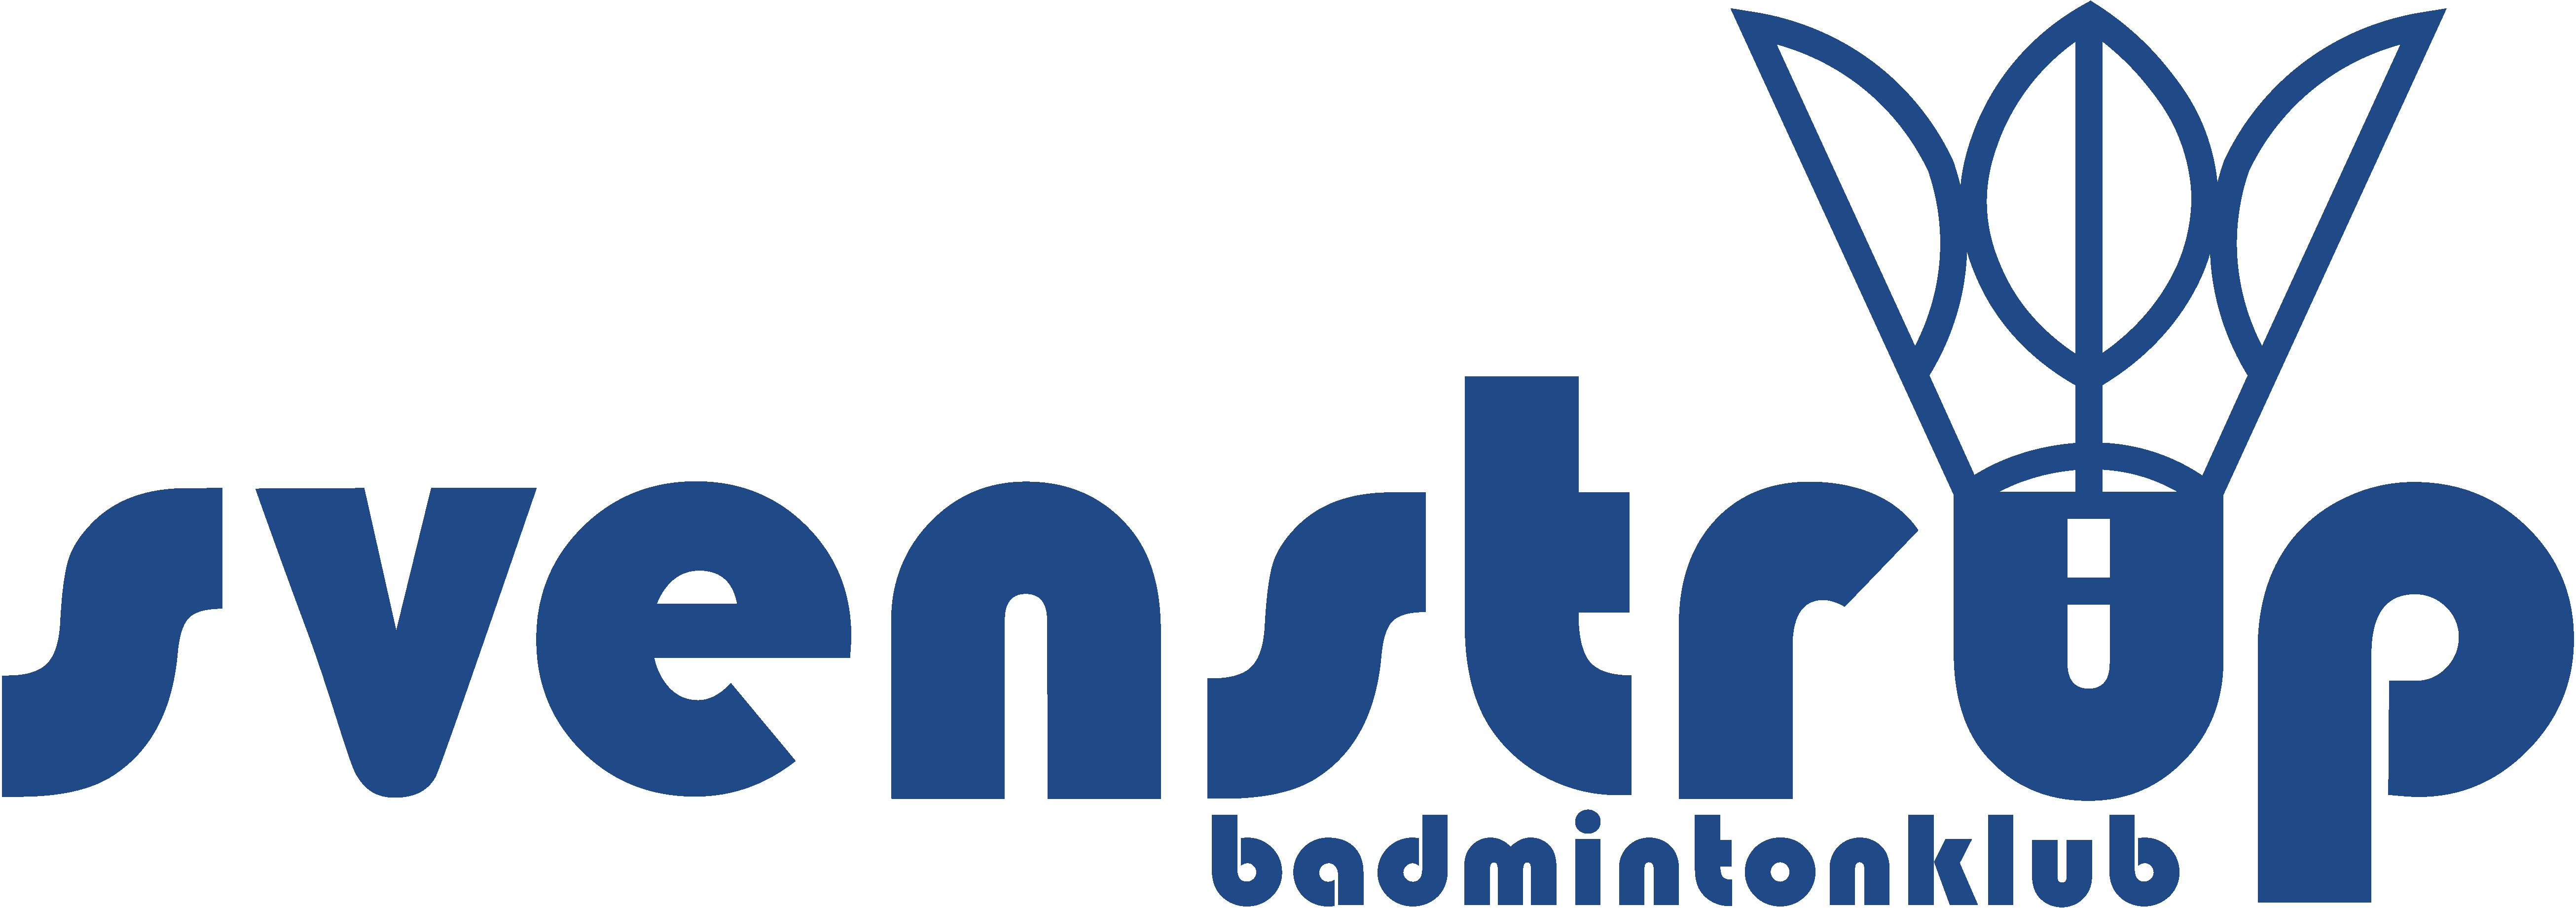 Svenstrup Badmintonklub